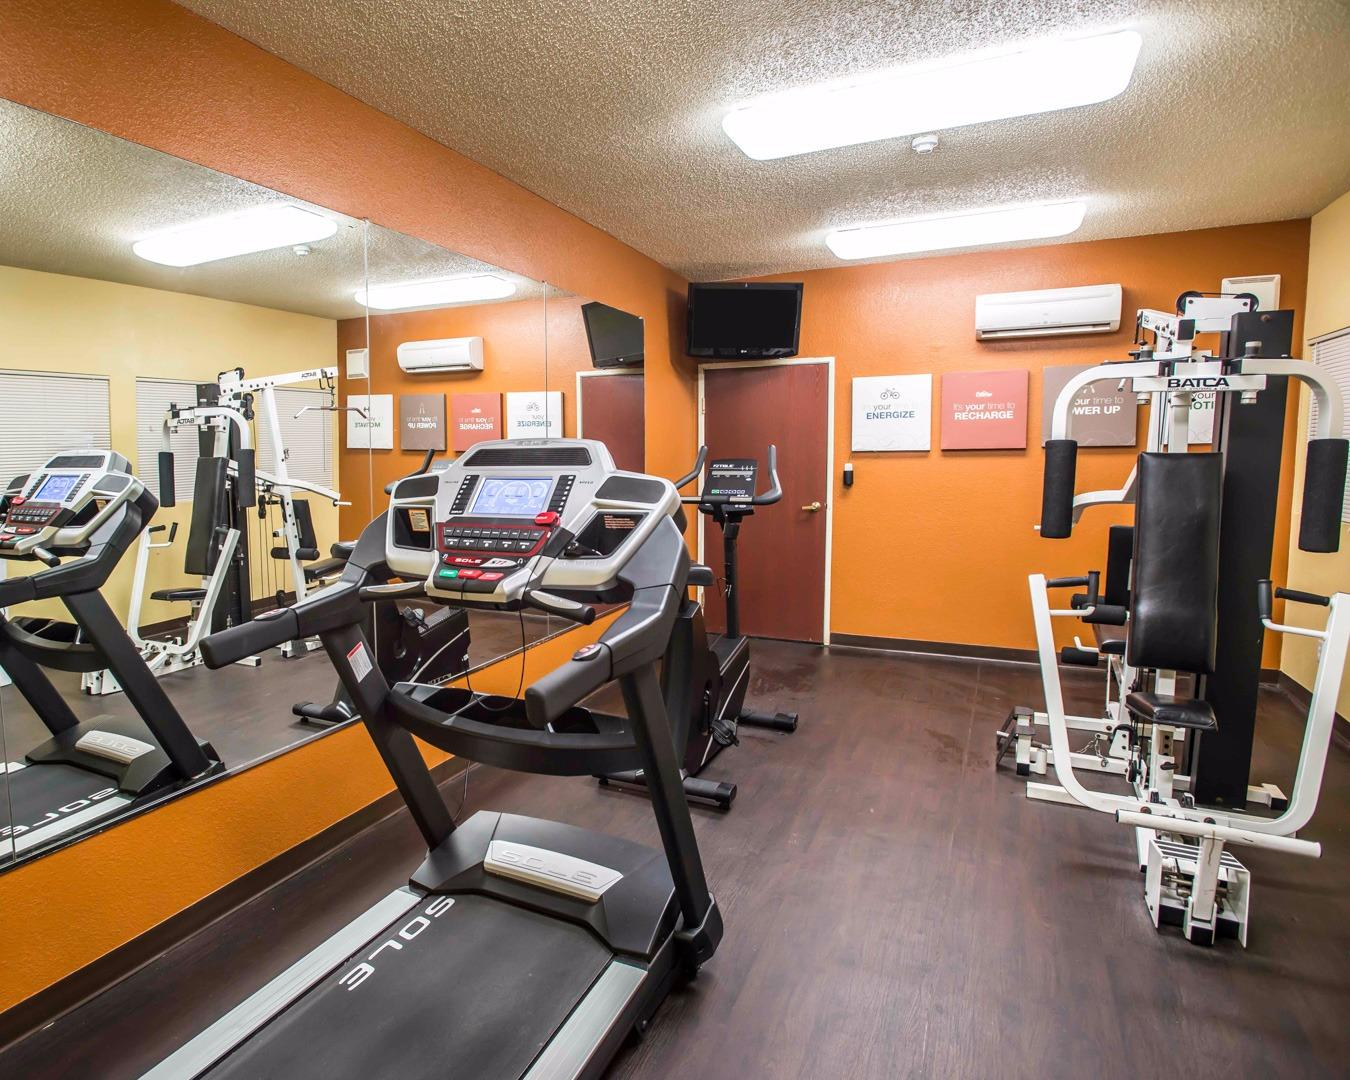 Comfort Suites Lakewood Denver in Lakewood CO 303 988 8600 #A76124